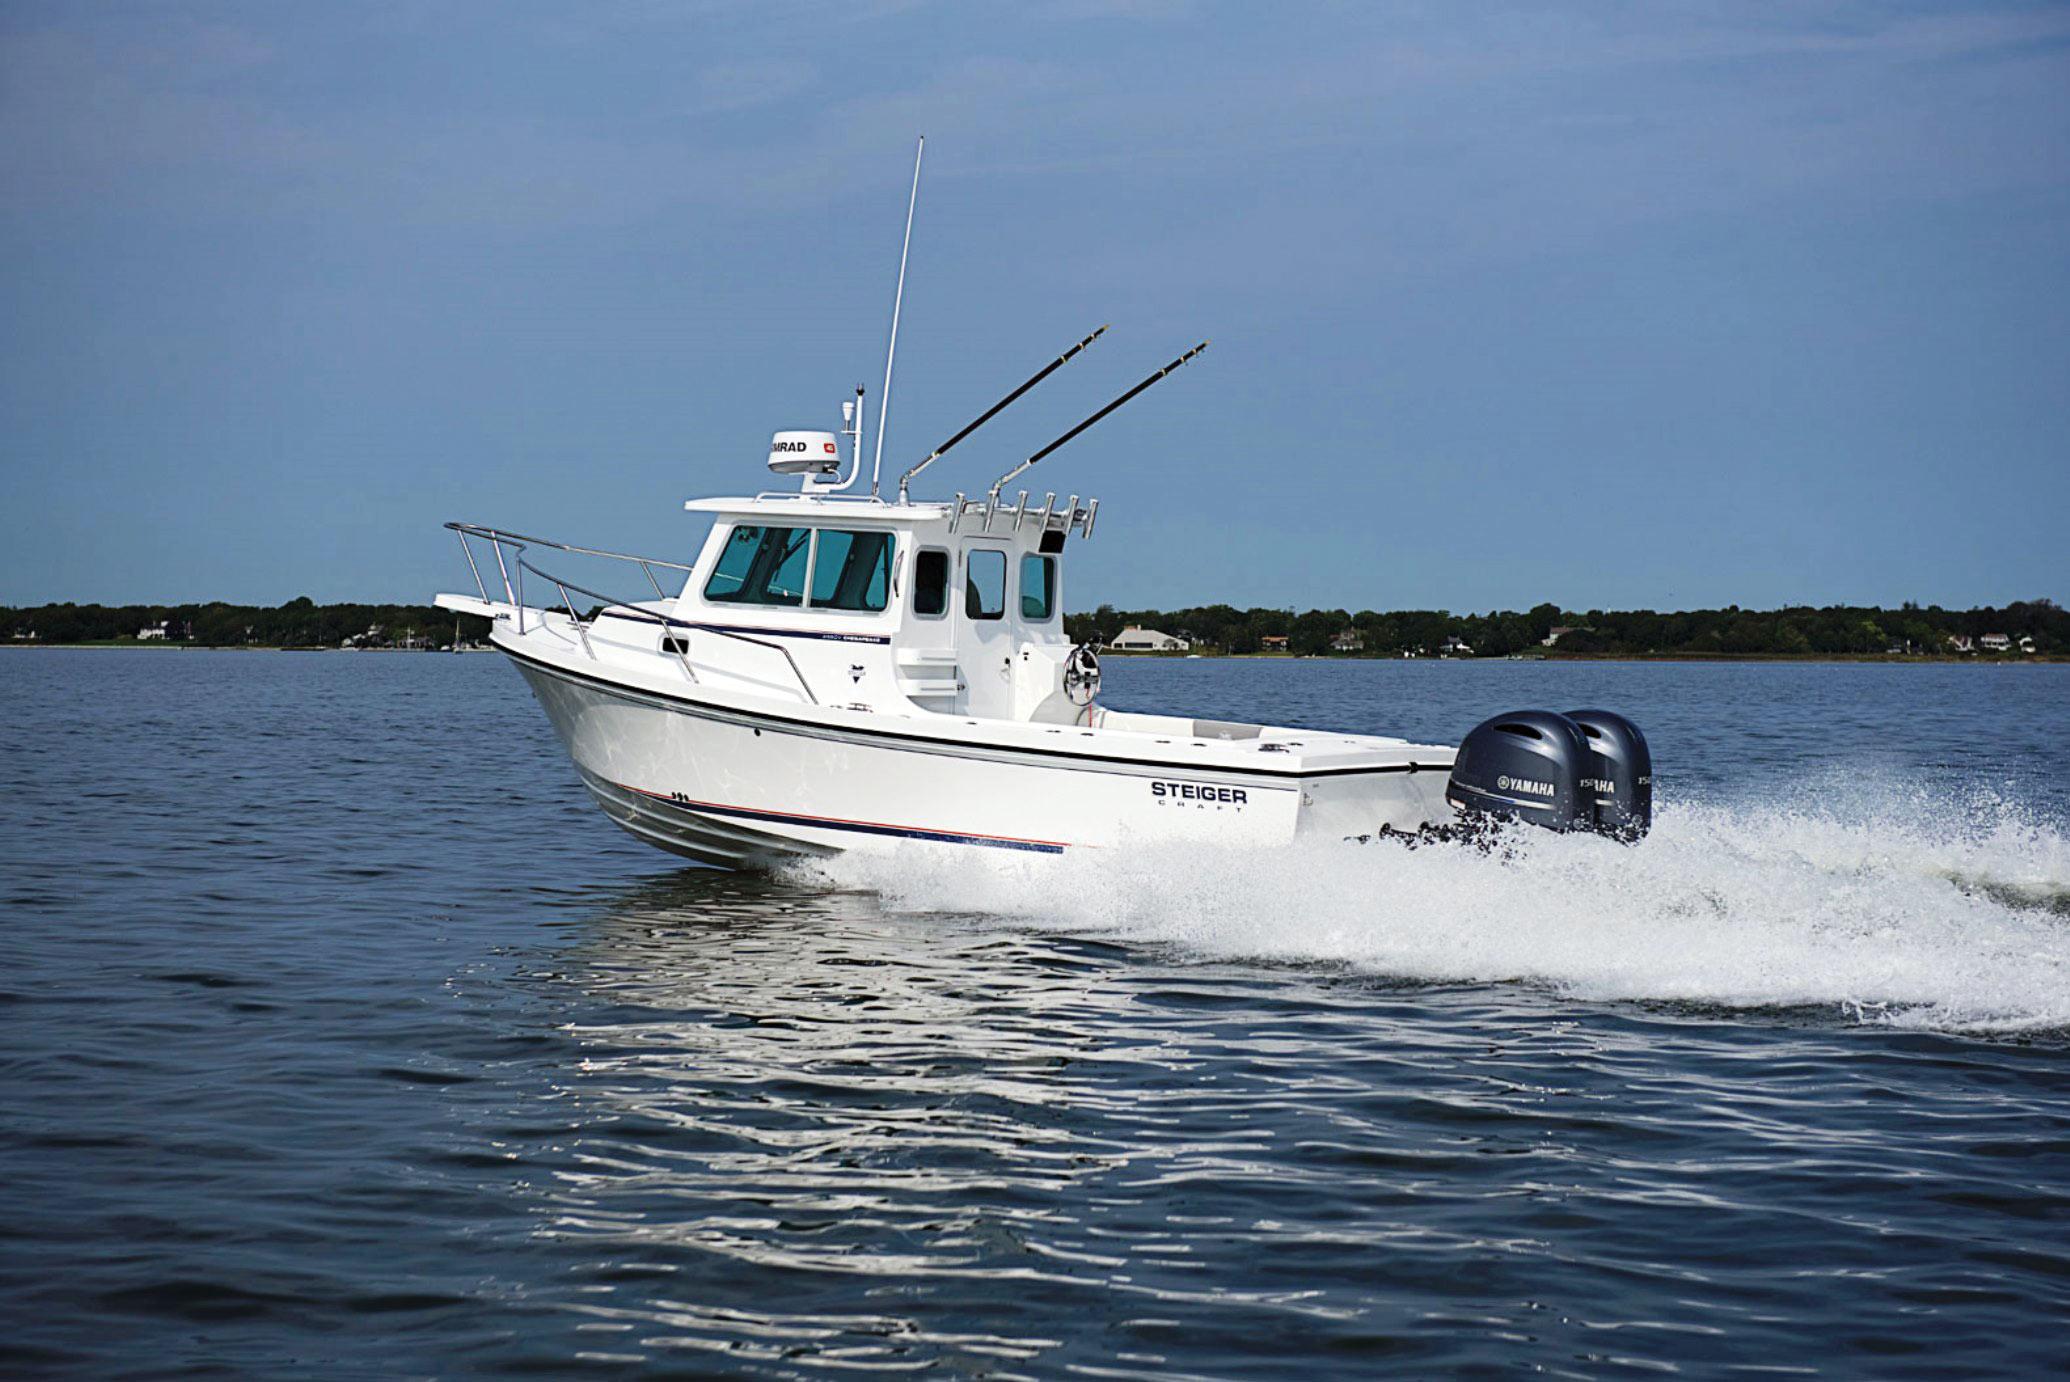 2019 1 Fishing Boat Buyers Guide Steigercraft 255 DV Chesapeake